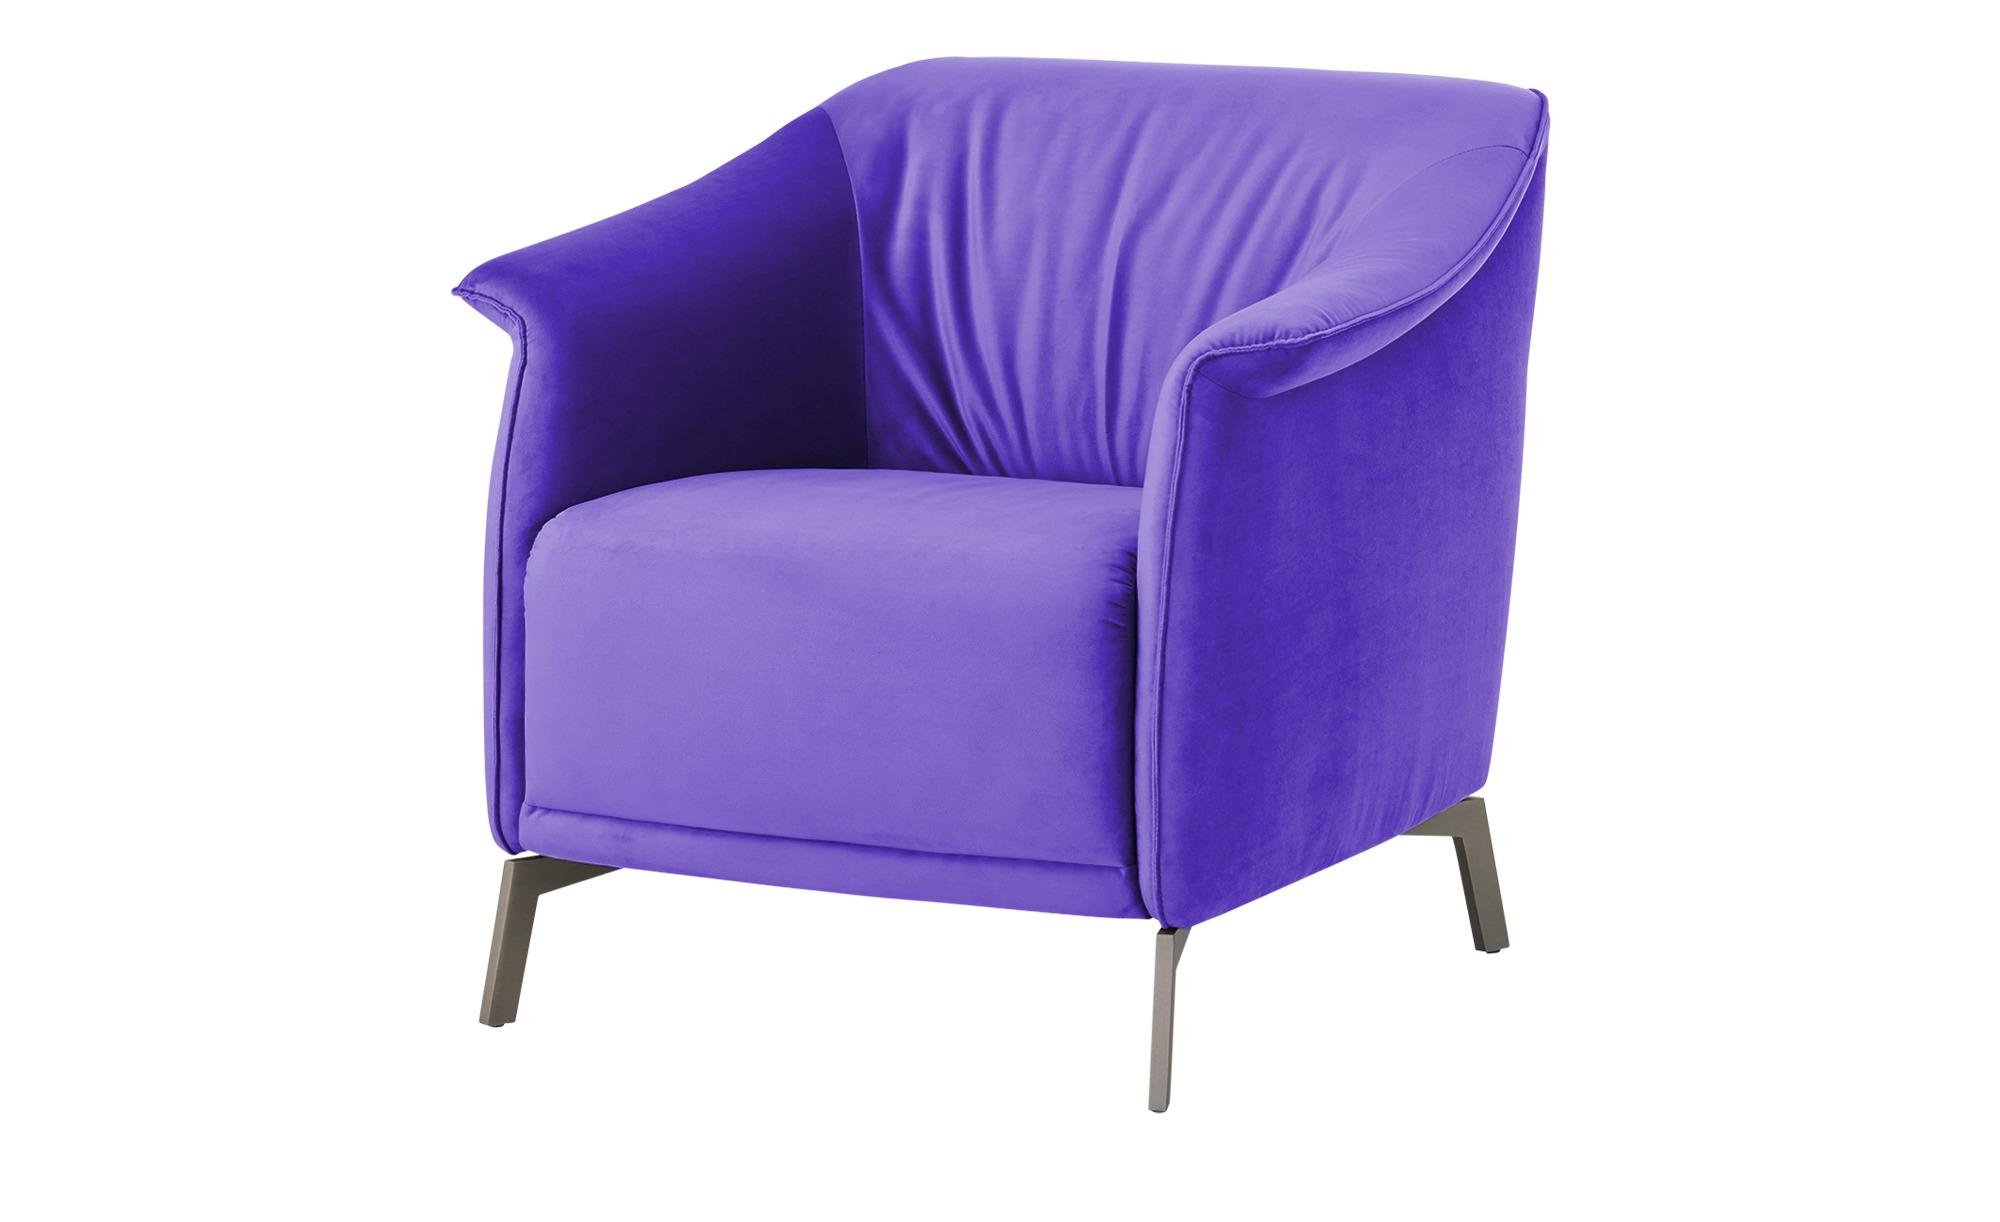 Sessel  Lamia ¦ lila/violett ¦ Maße (cm): B: 80 H: 77 T: 83 Polstermöbel > Sessel > Polstersessel - Höffner